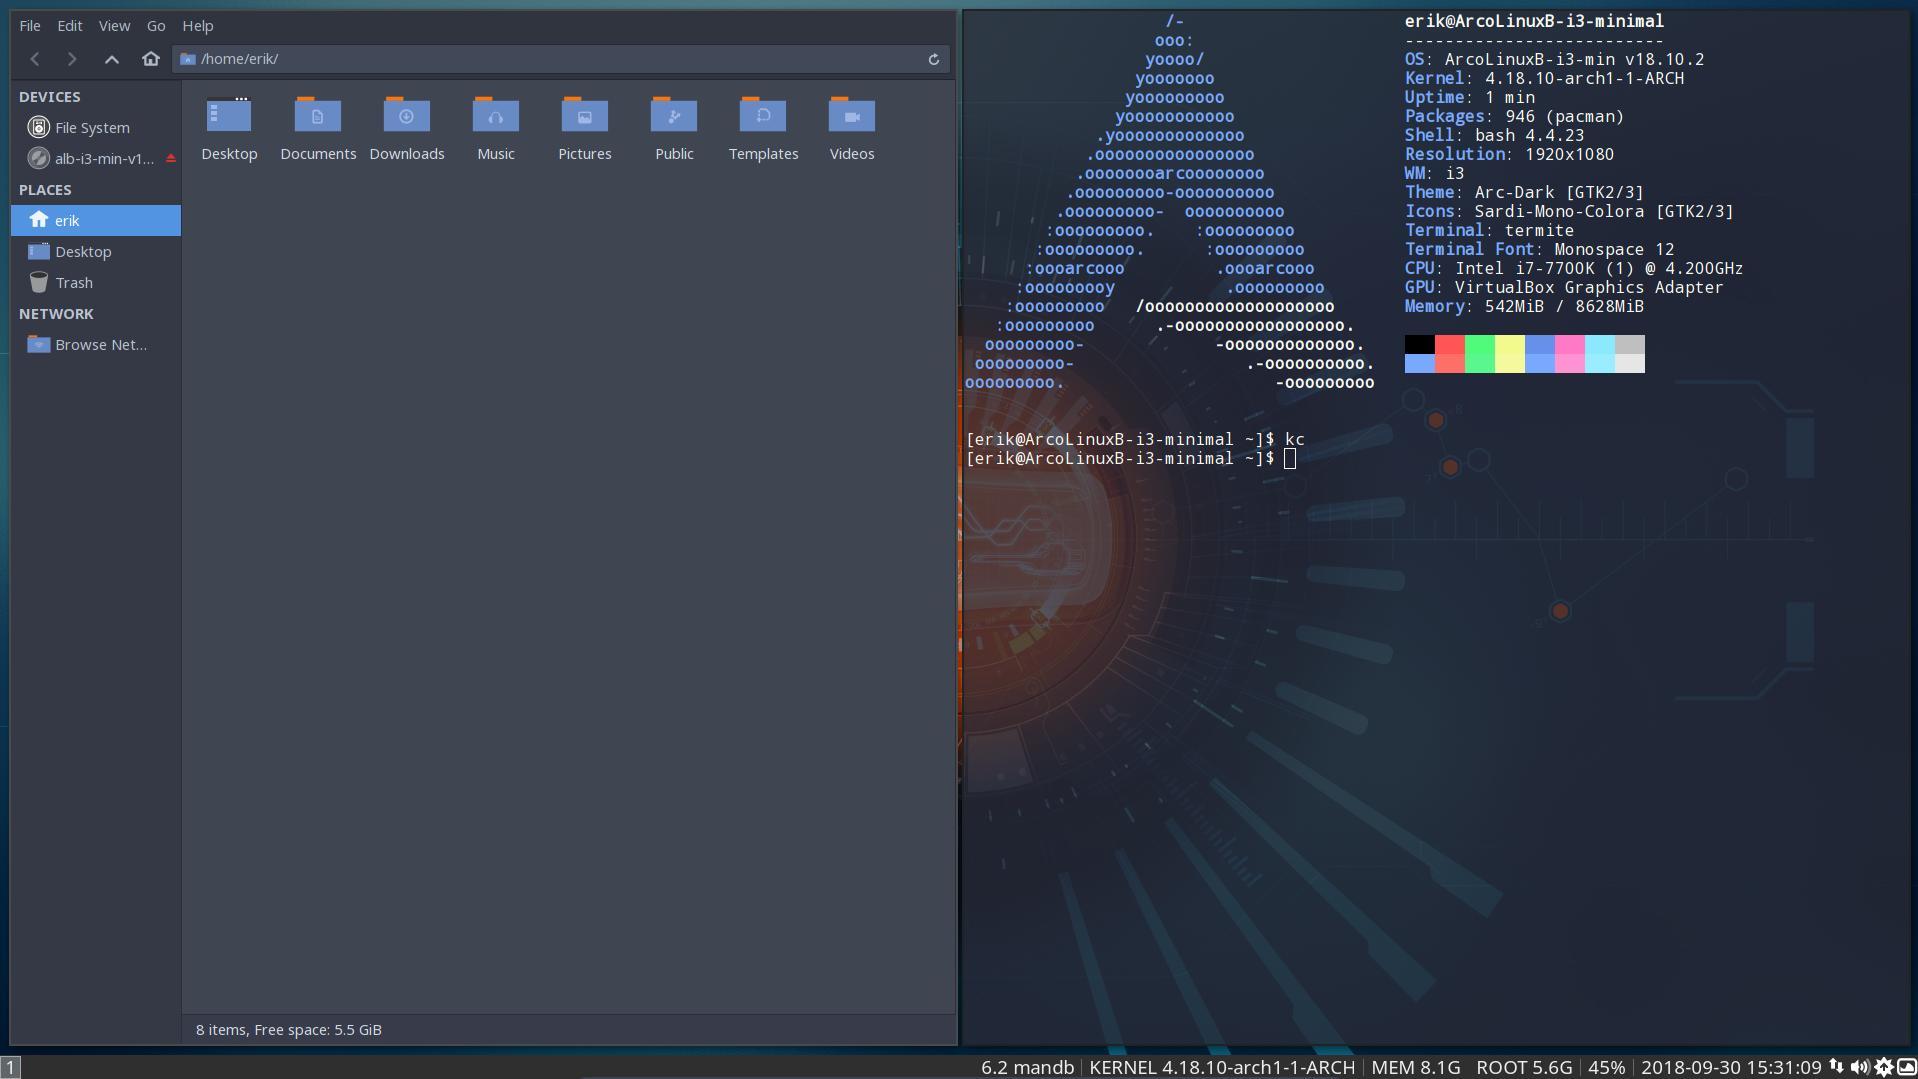 BYOI on ArcoLinux – i3 Minimal | Arcolinuxb com